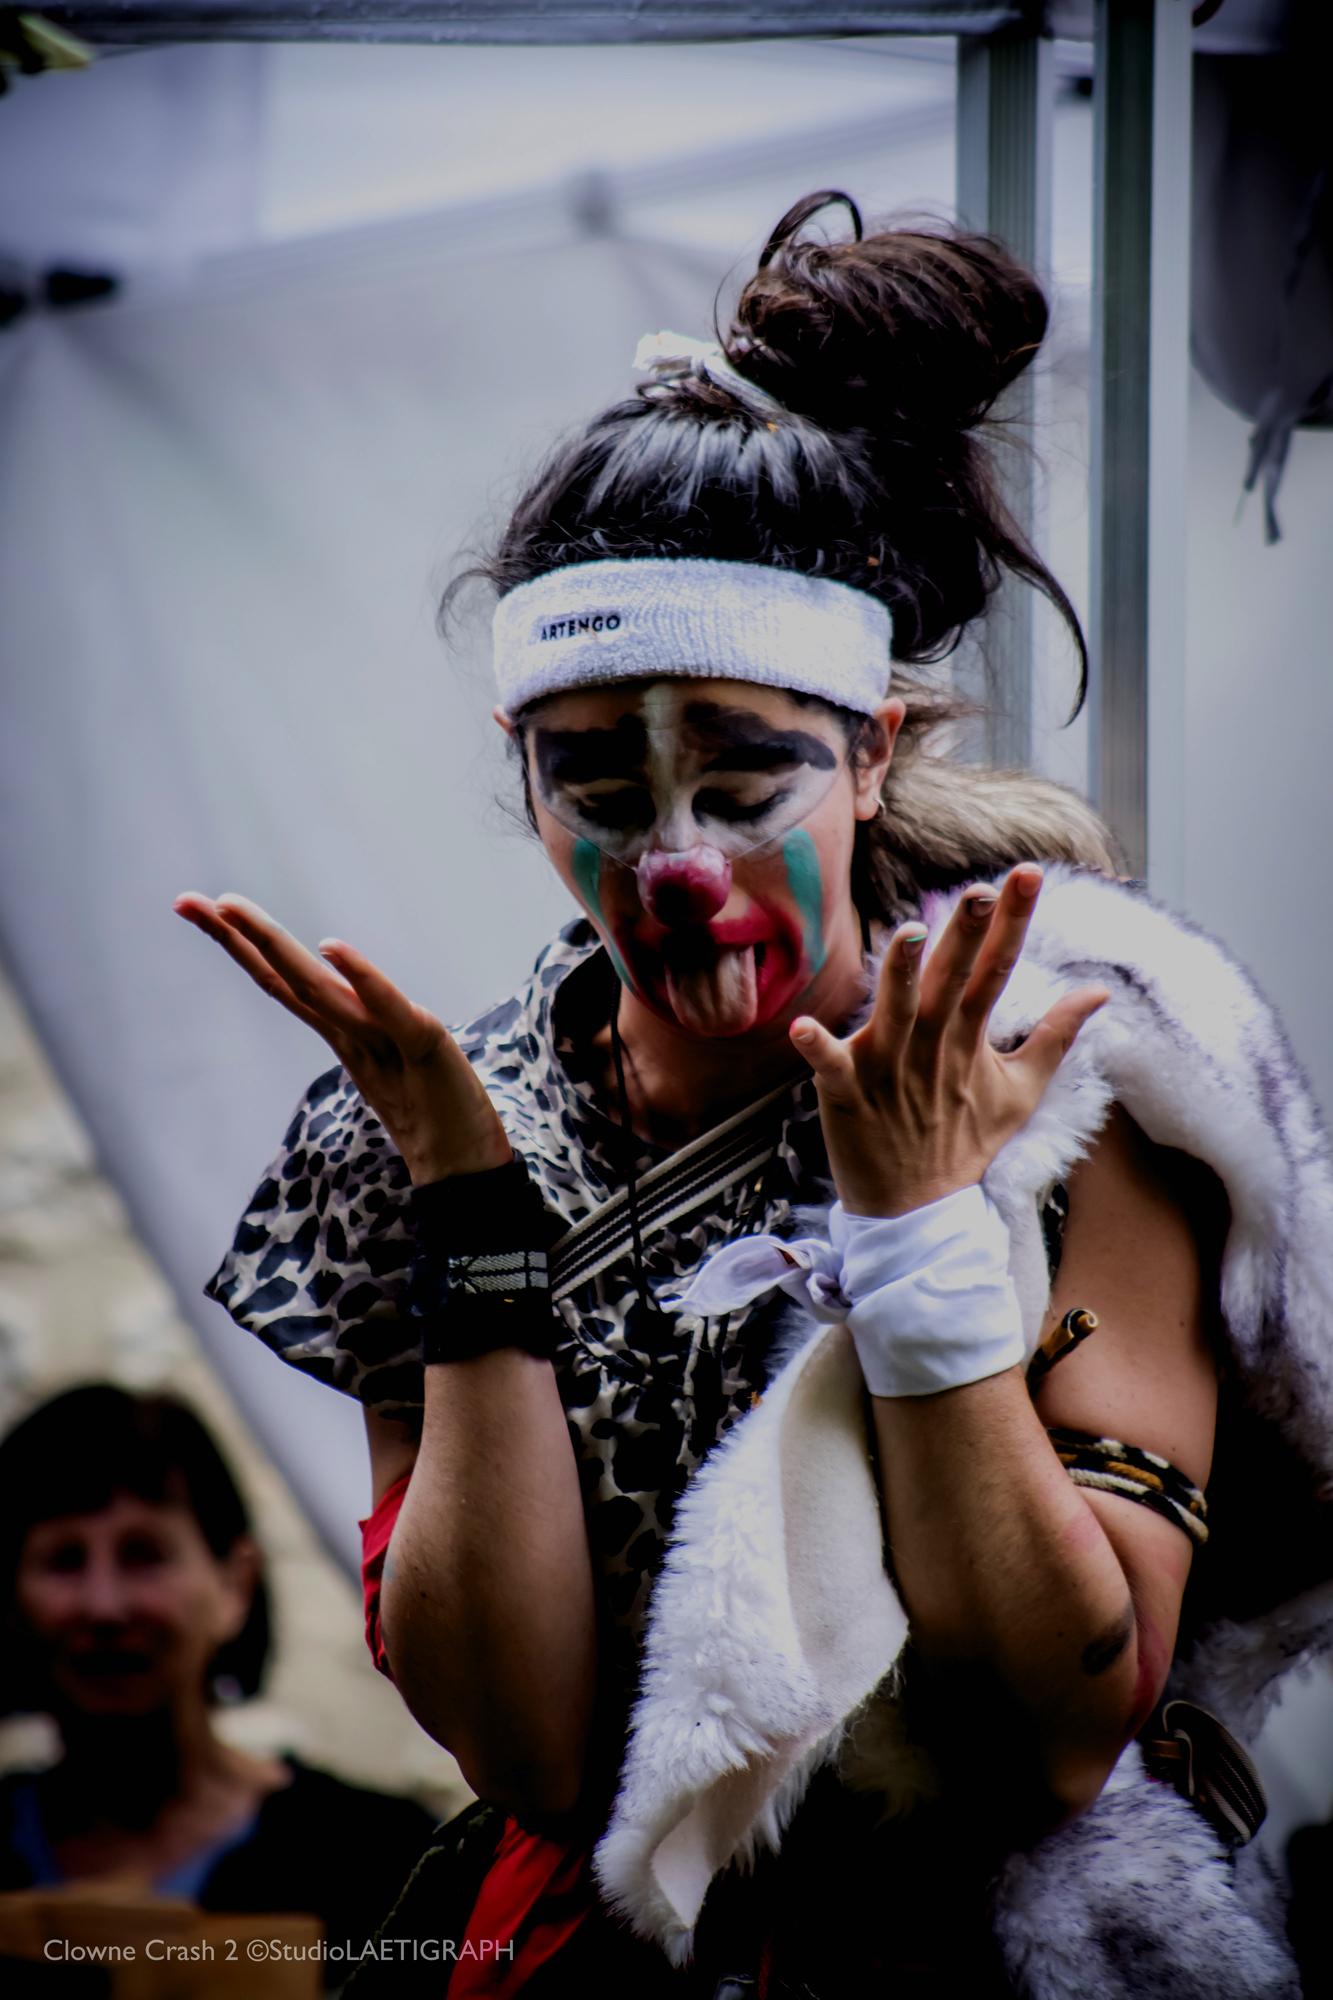 LMDCB21_clownscrash2-15